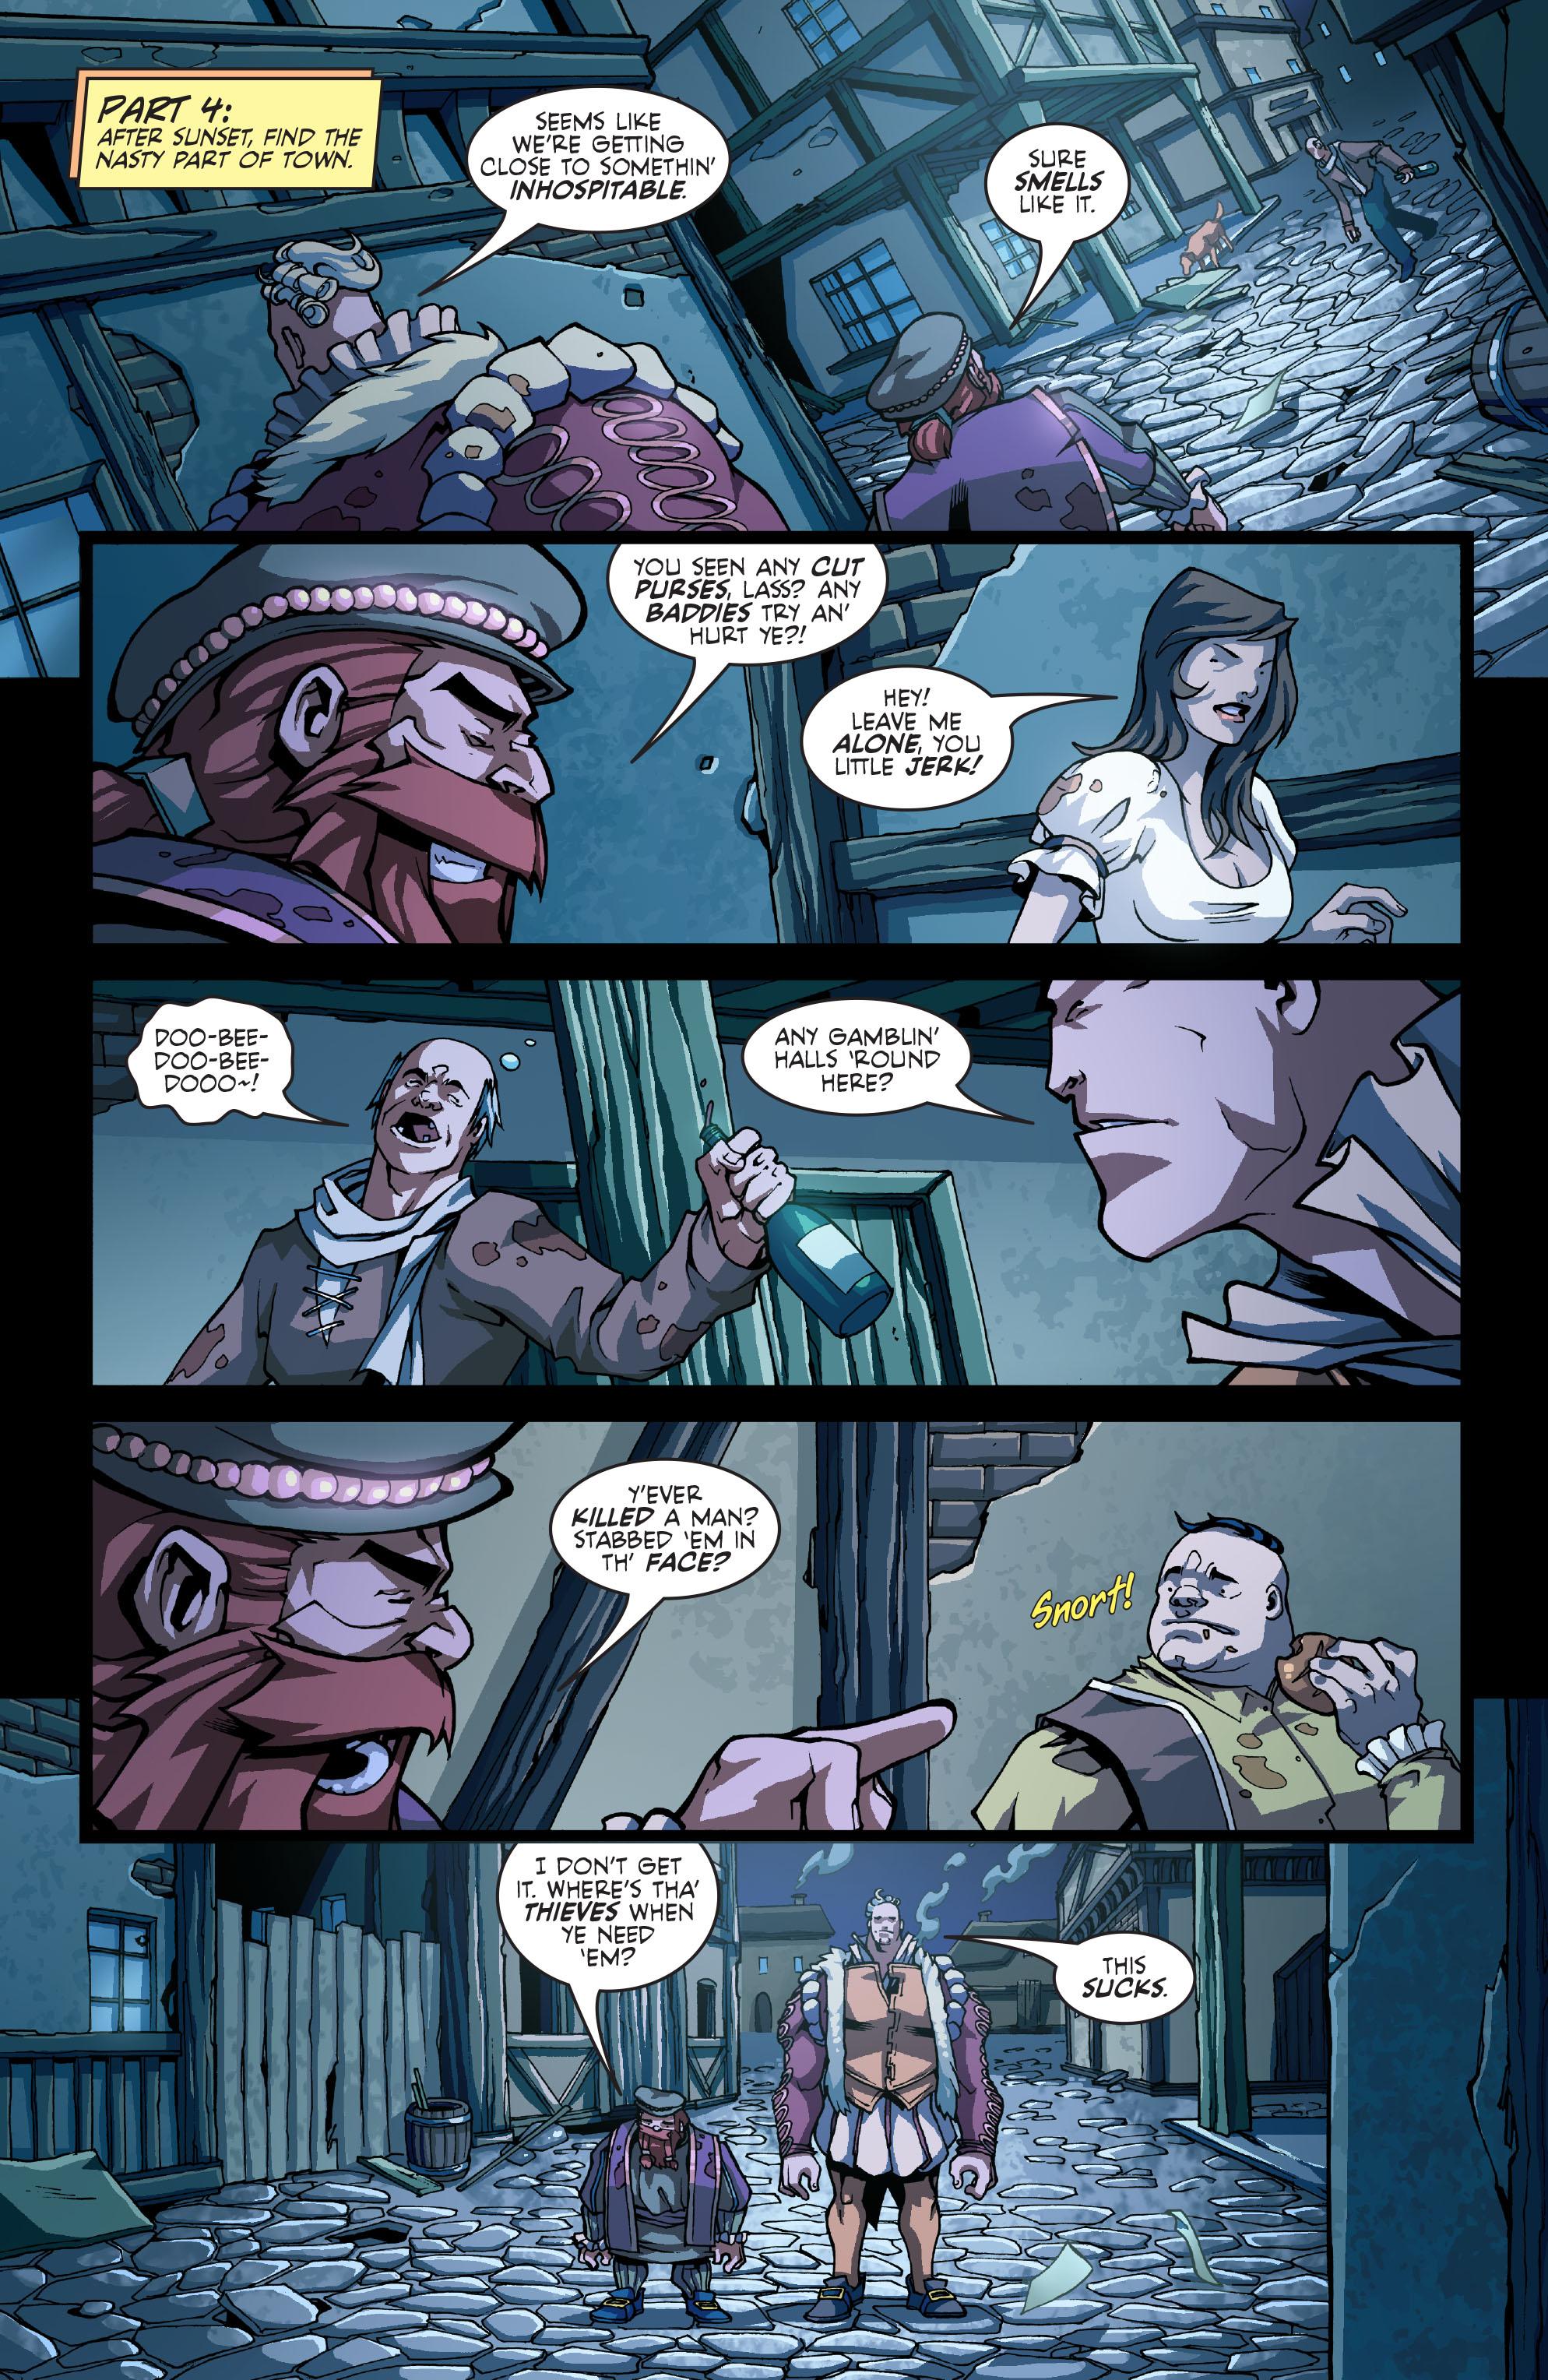 Read online Skullkickers comic -  Issue #8 - 11